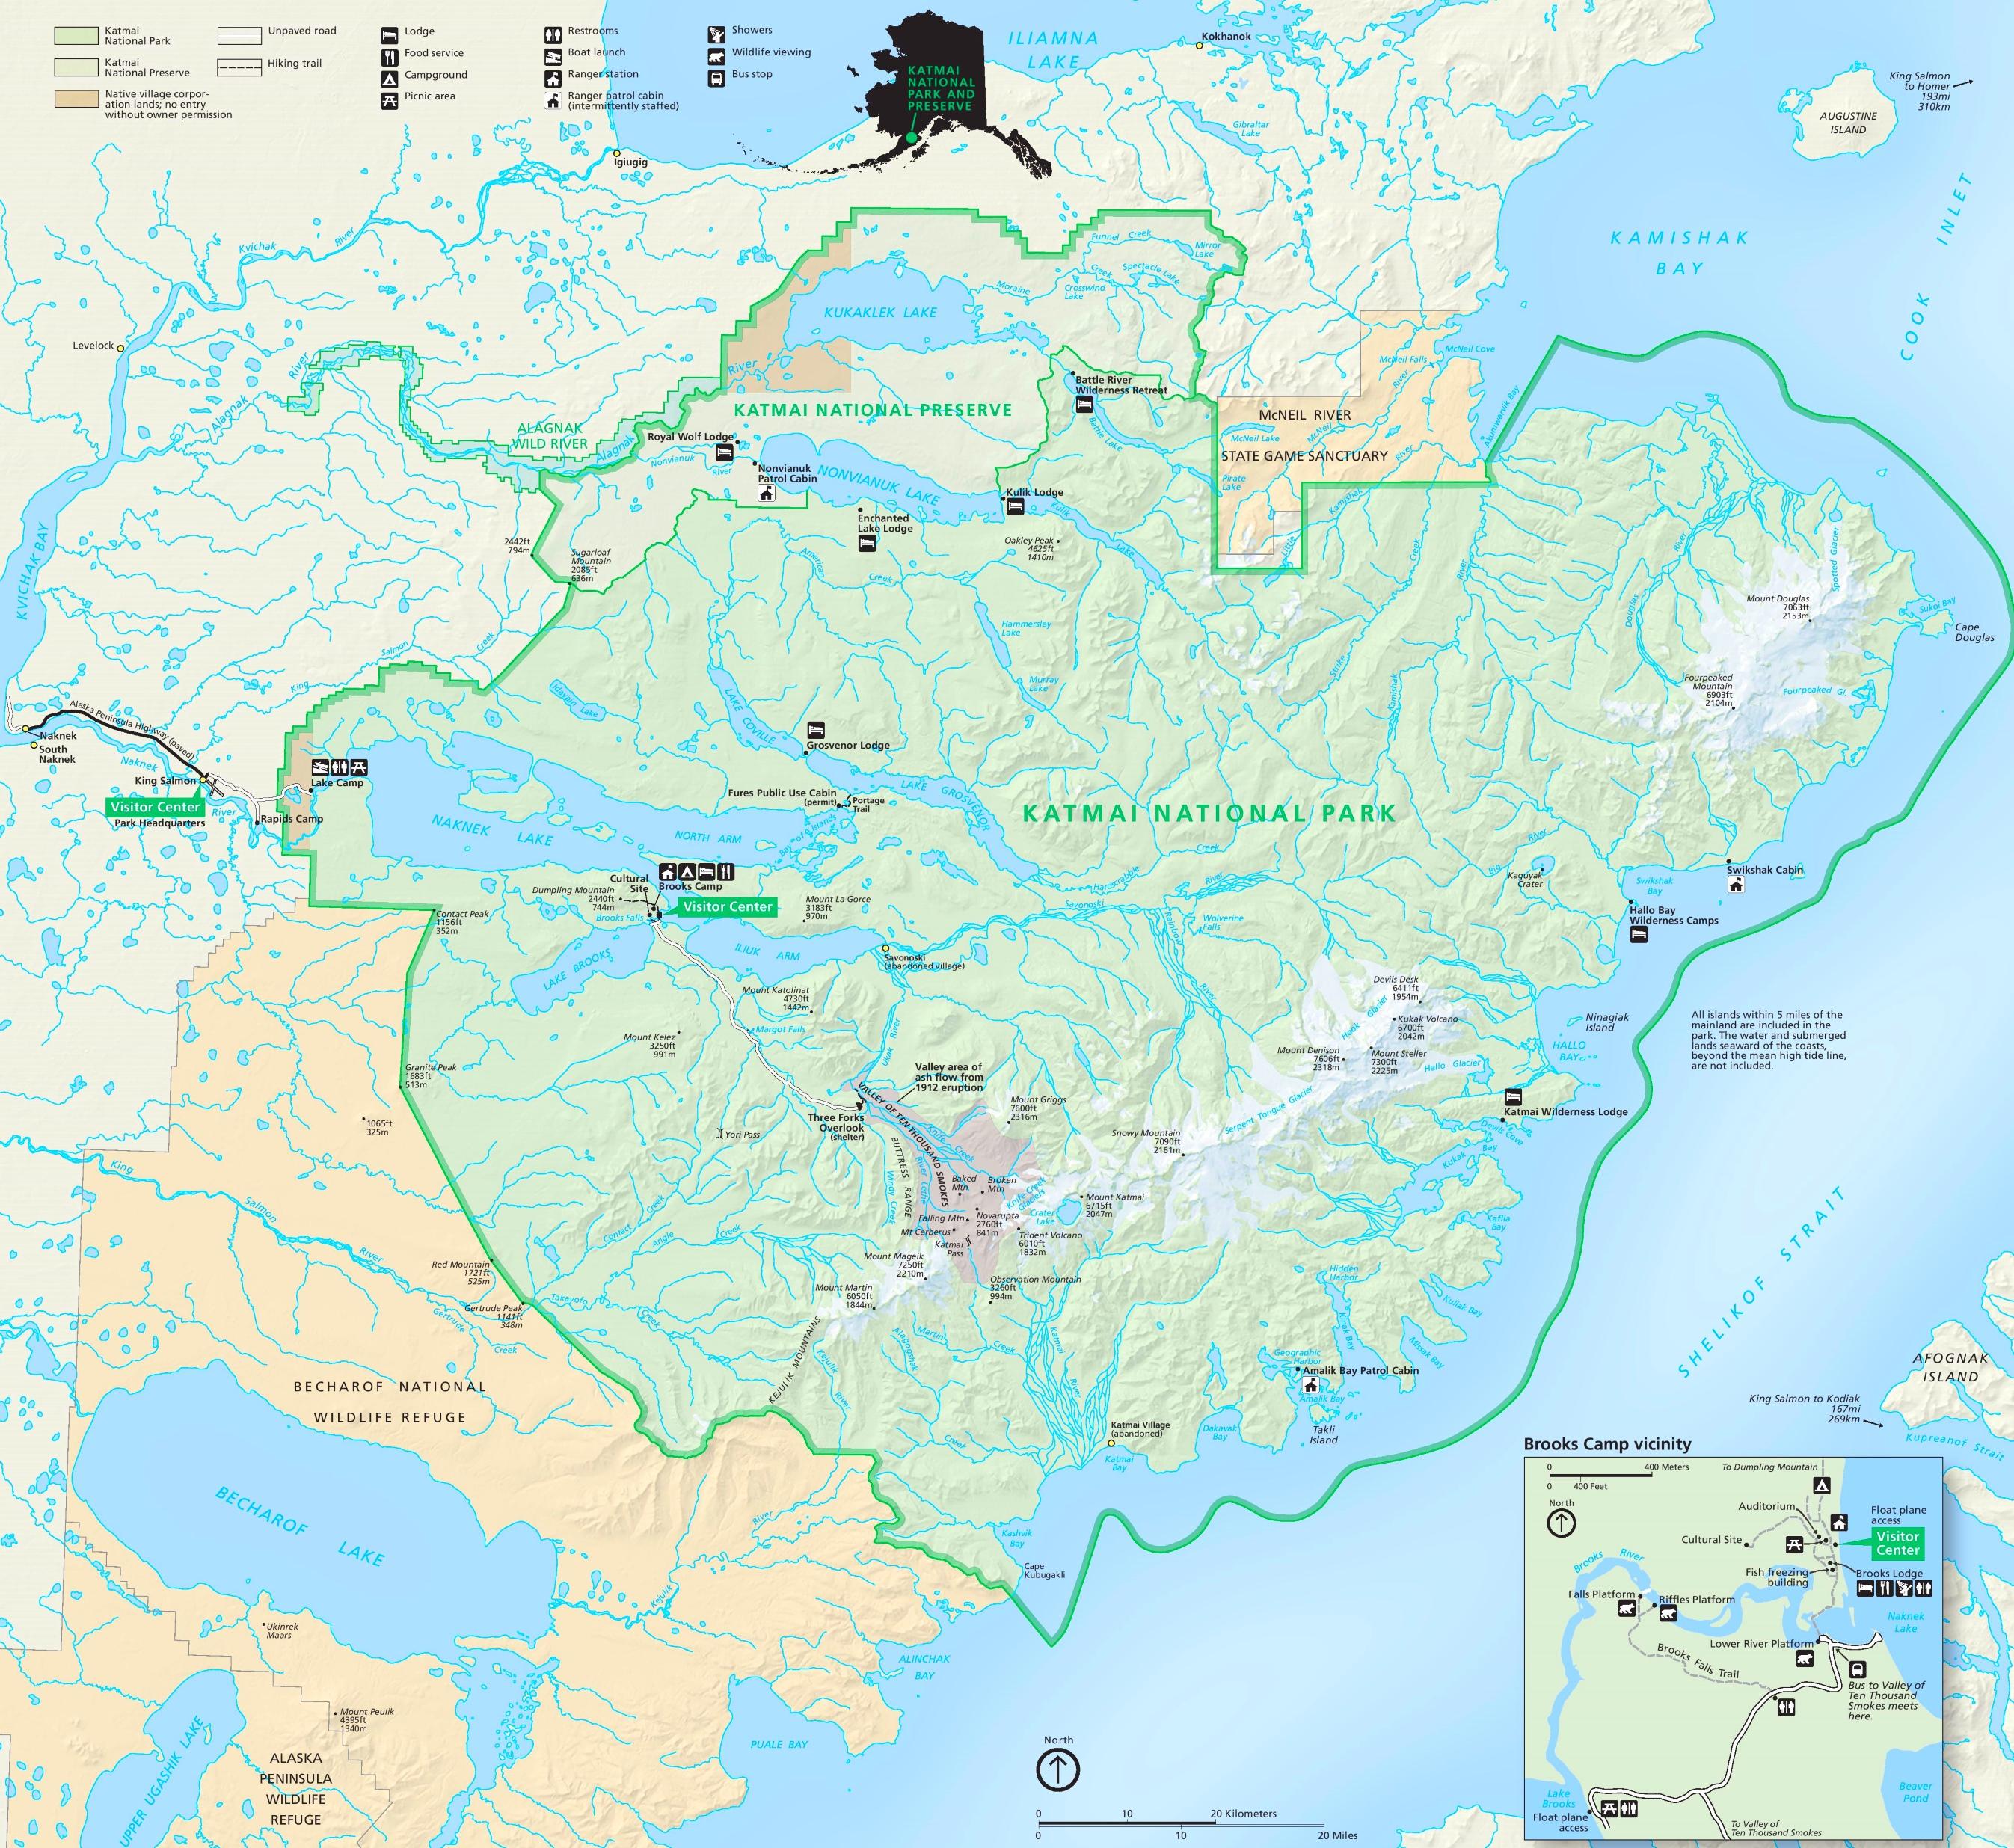 Katmai National Park Maps USA Maps of Katmai National Park and